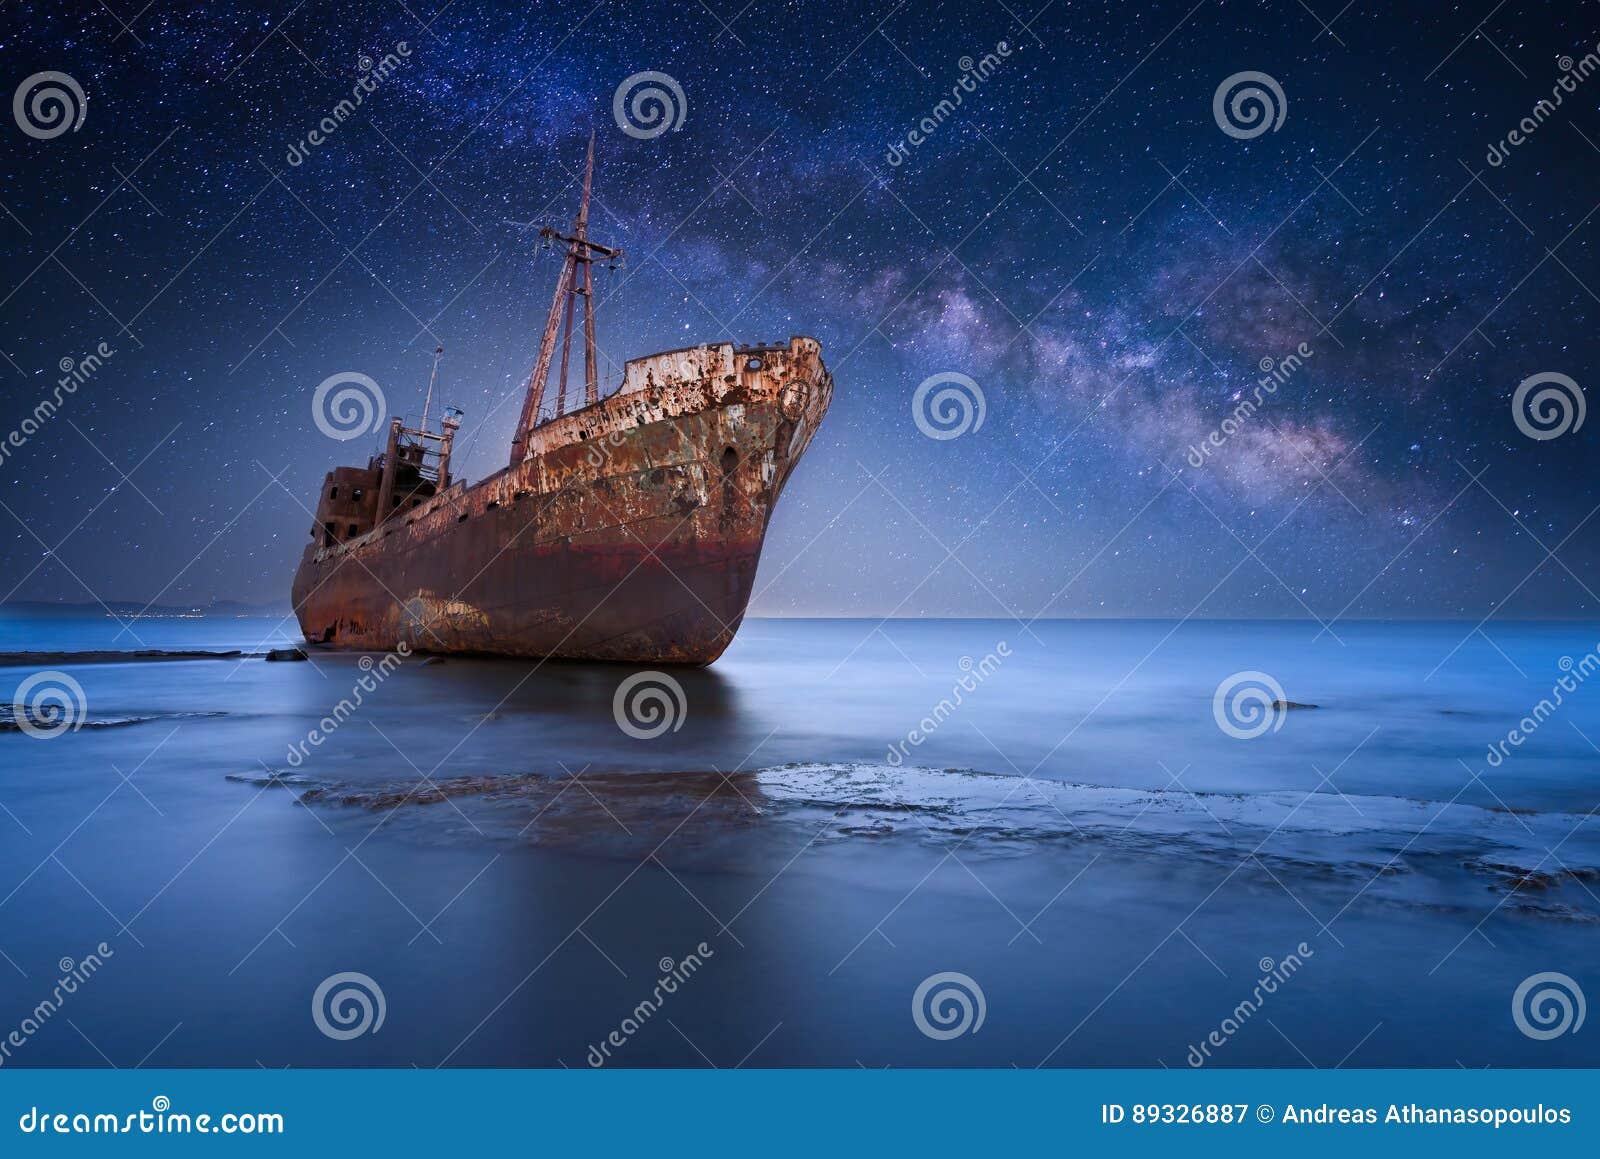 Skeppsbrott